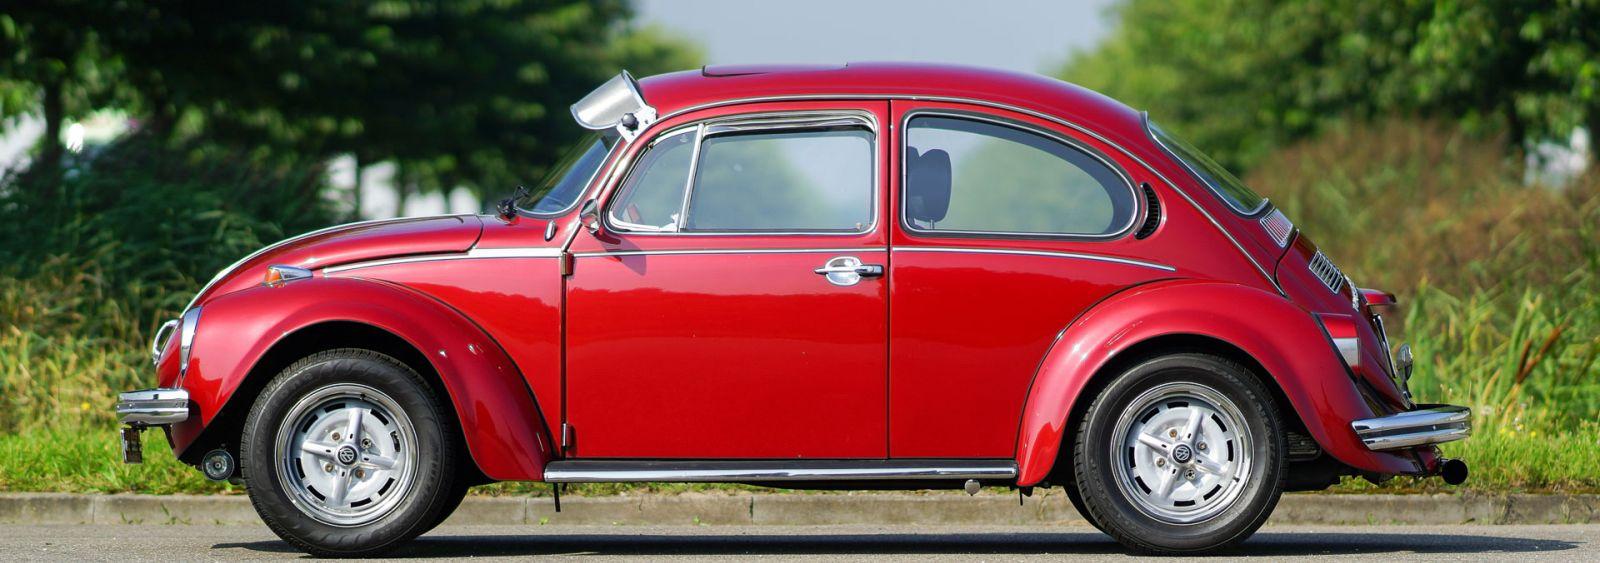 Old Ist Car